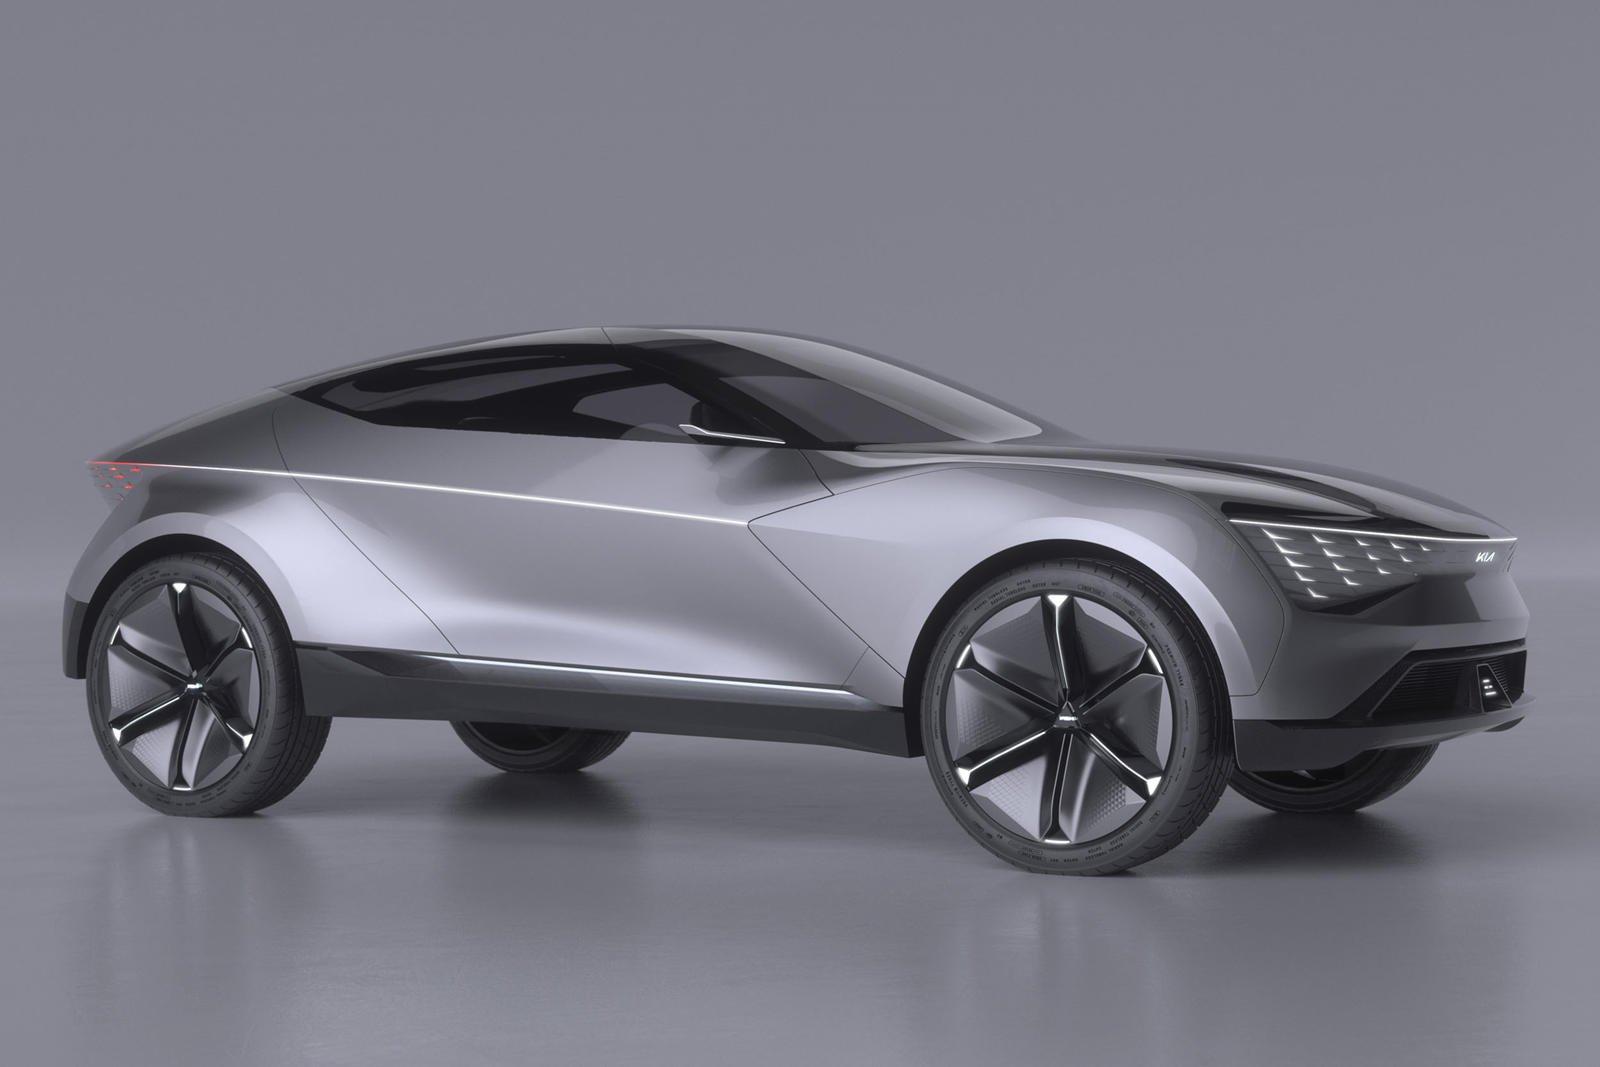 Mẫu xe concept Kia Futuron - ảnh 1.